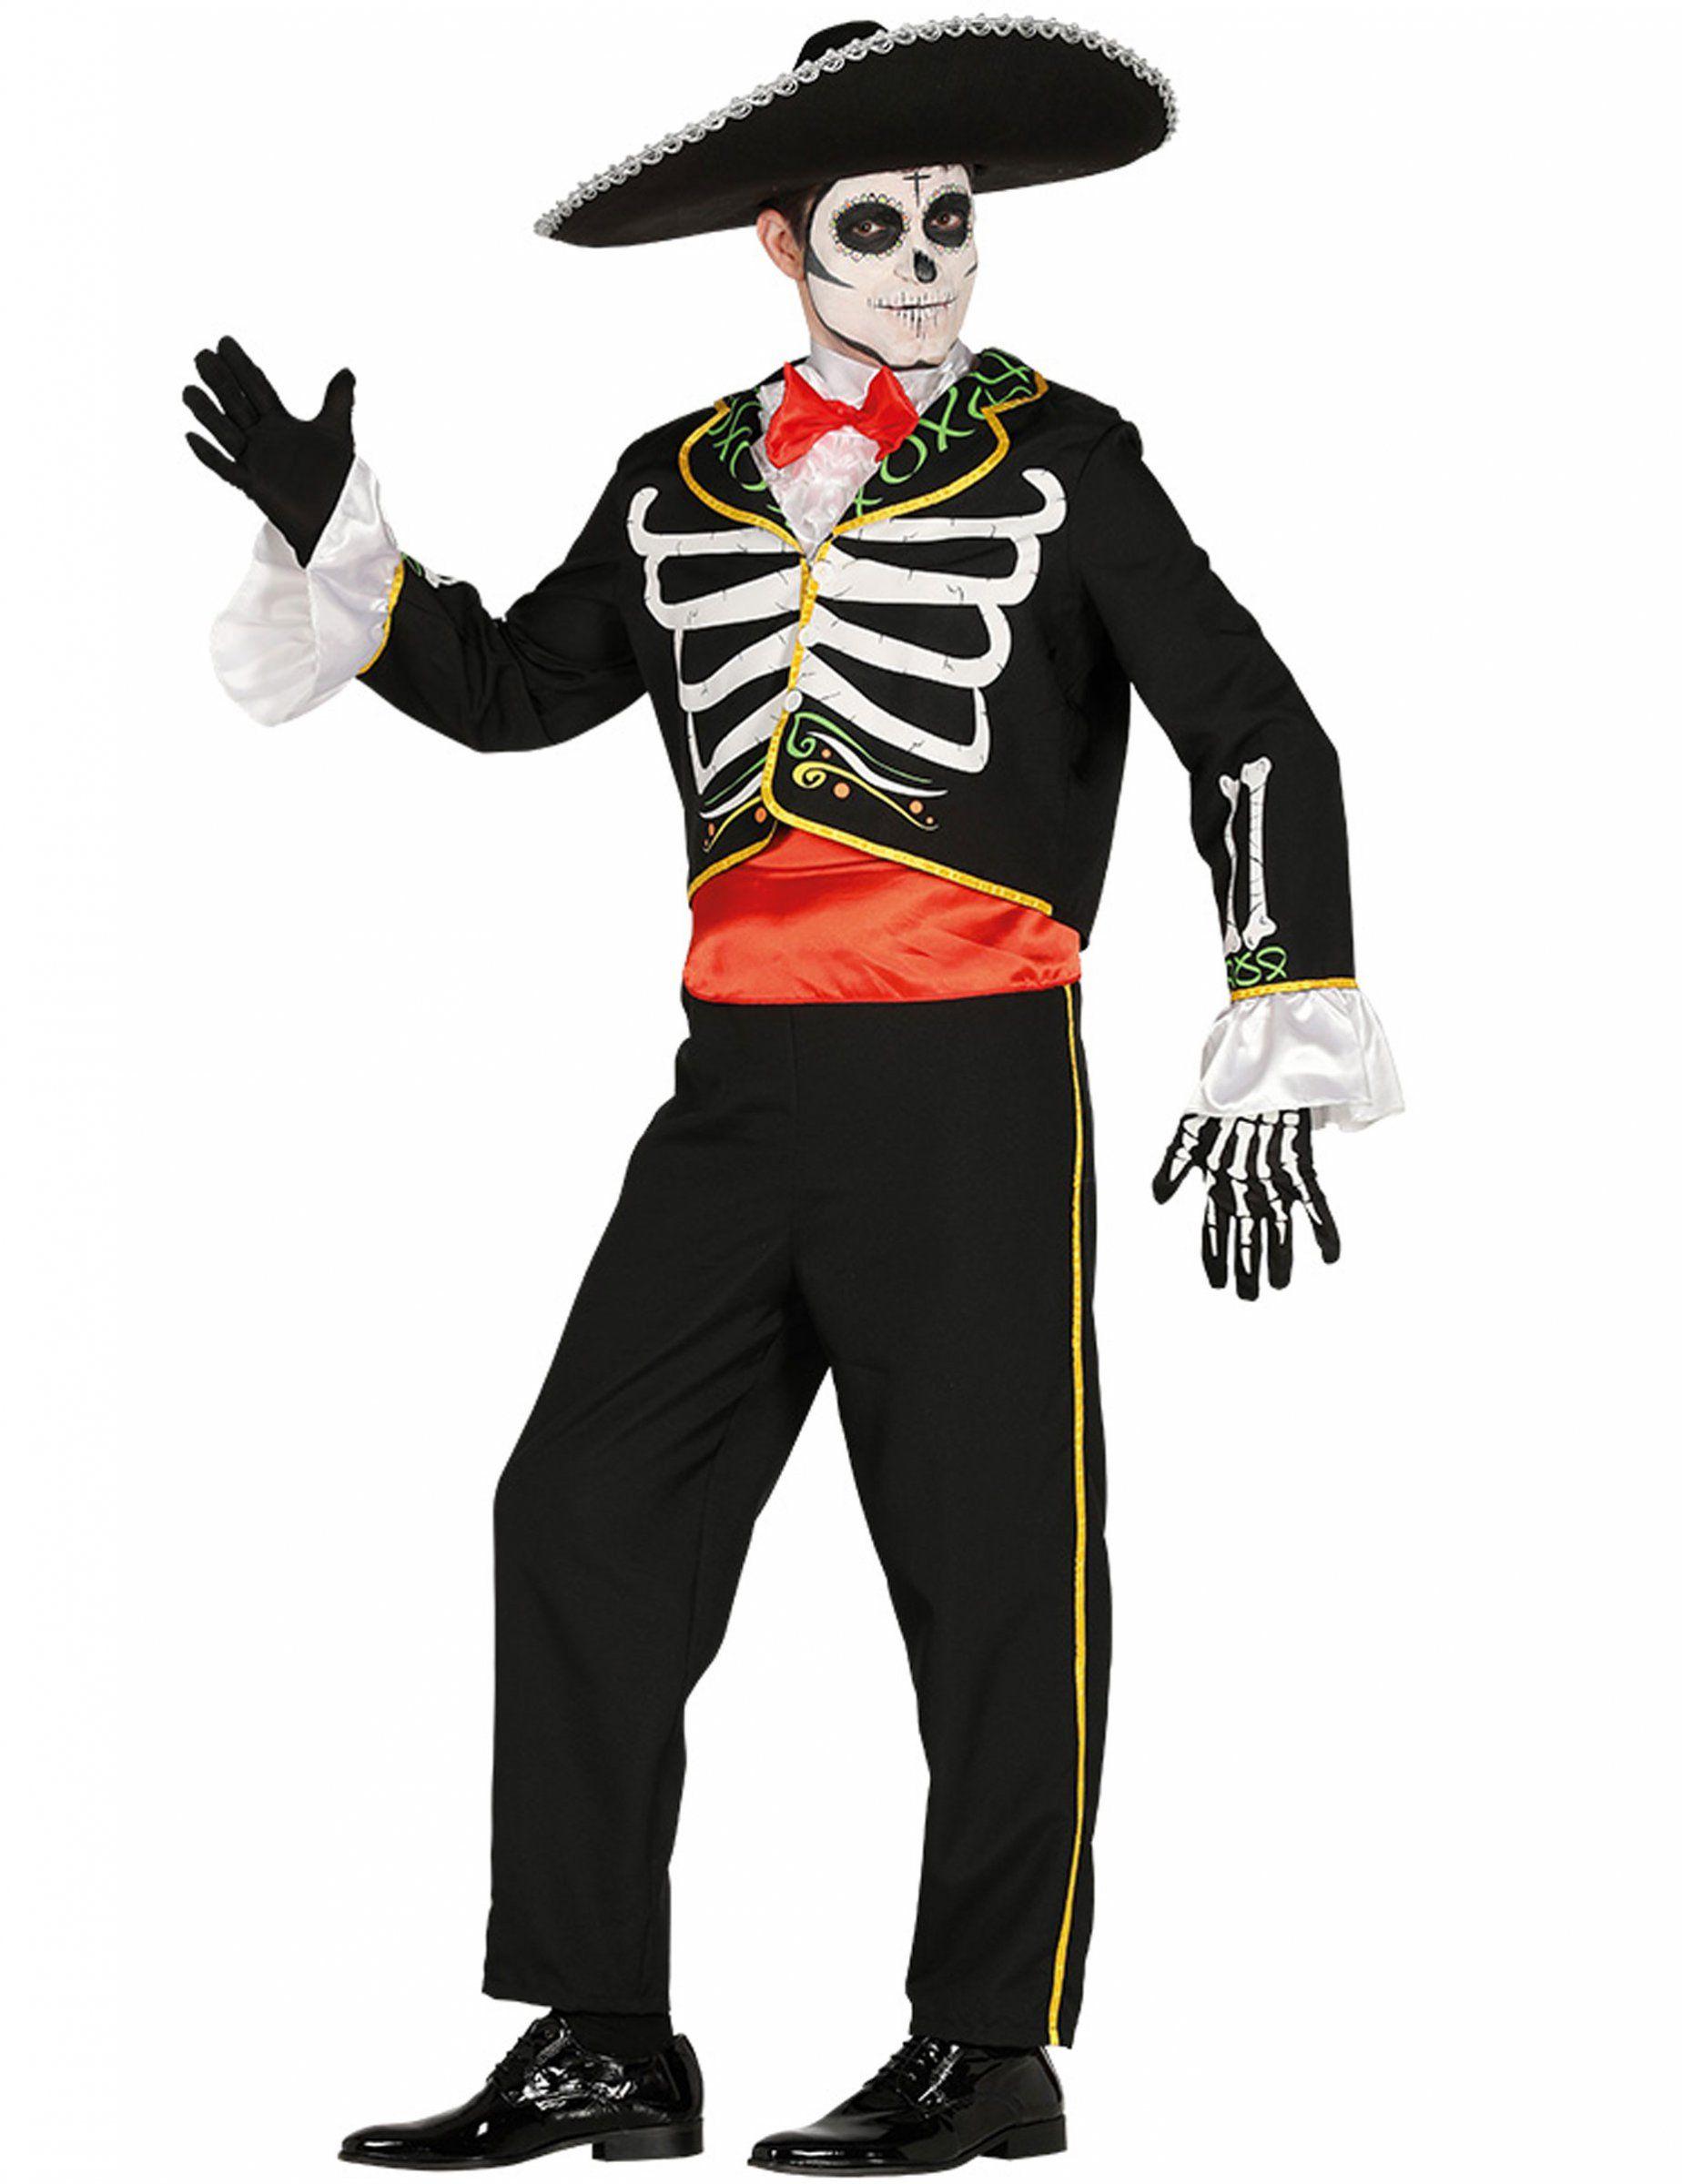 Costume da mariachi scheletro per uomo Dia de los muertos  Un travestimento  da mariachi scheletro 778615a7621